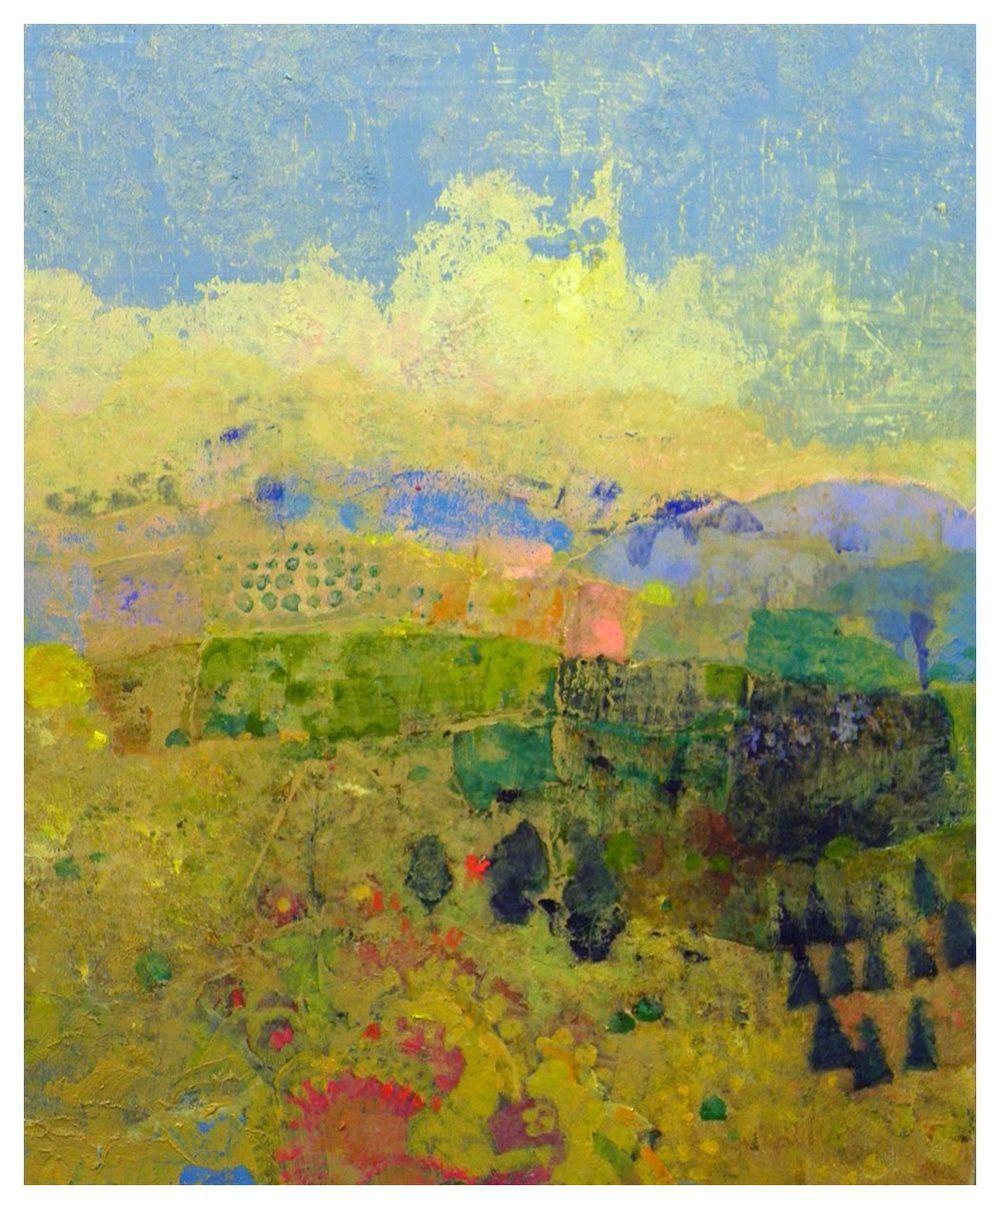 20 mark english abstract art landscape landscape art